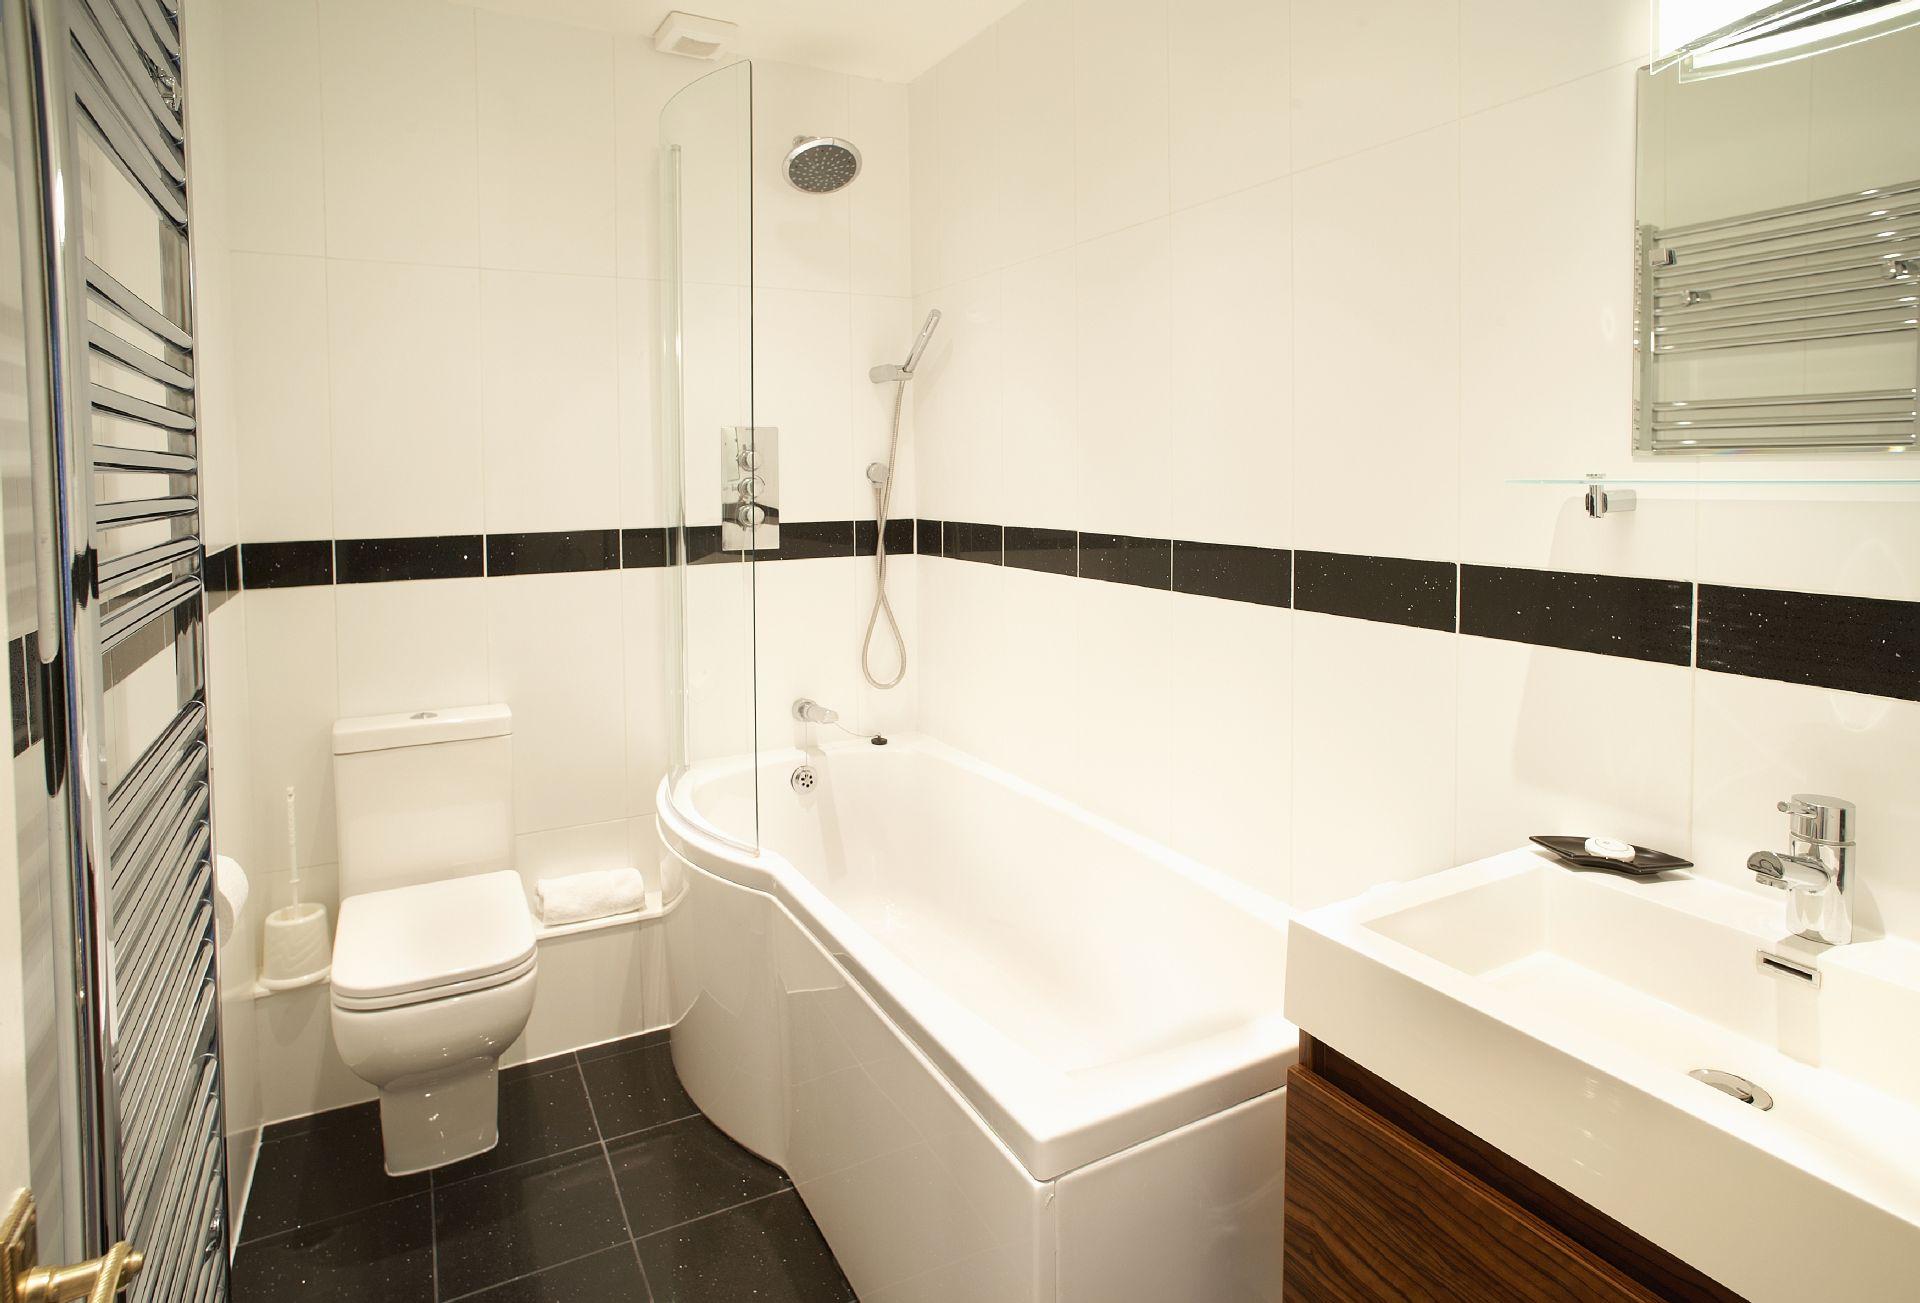 Second floor: The bathroom